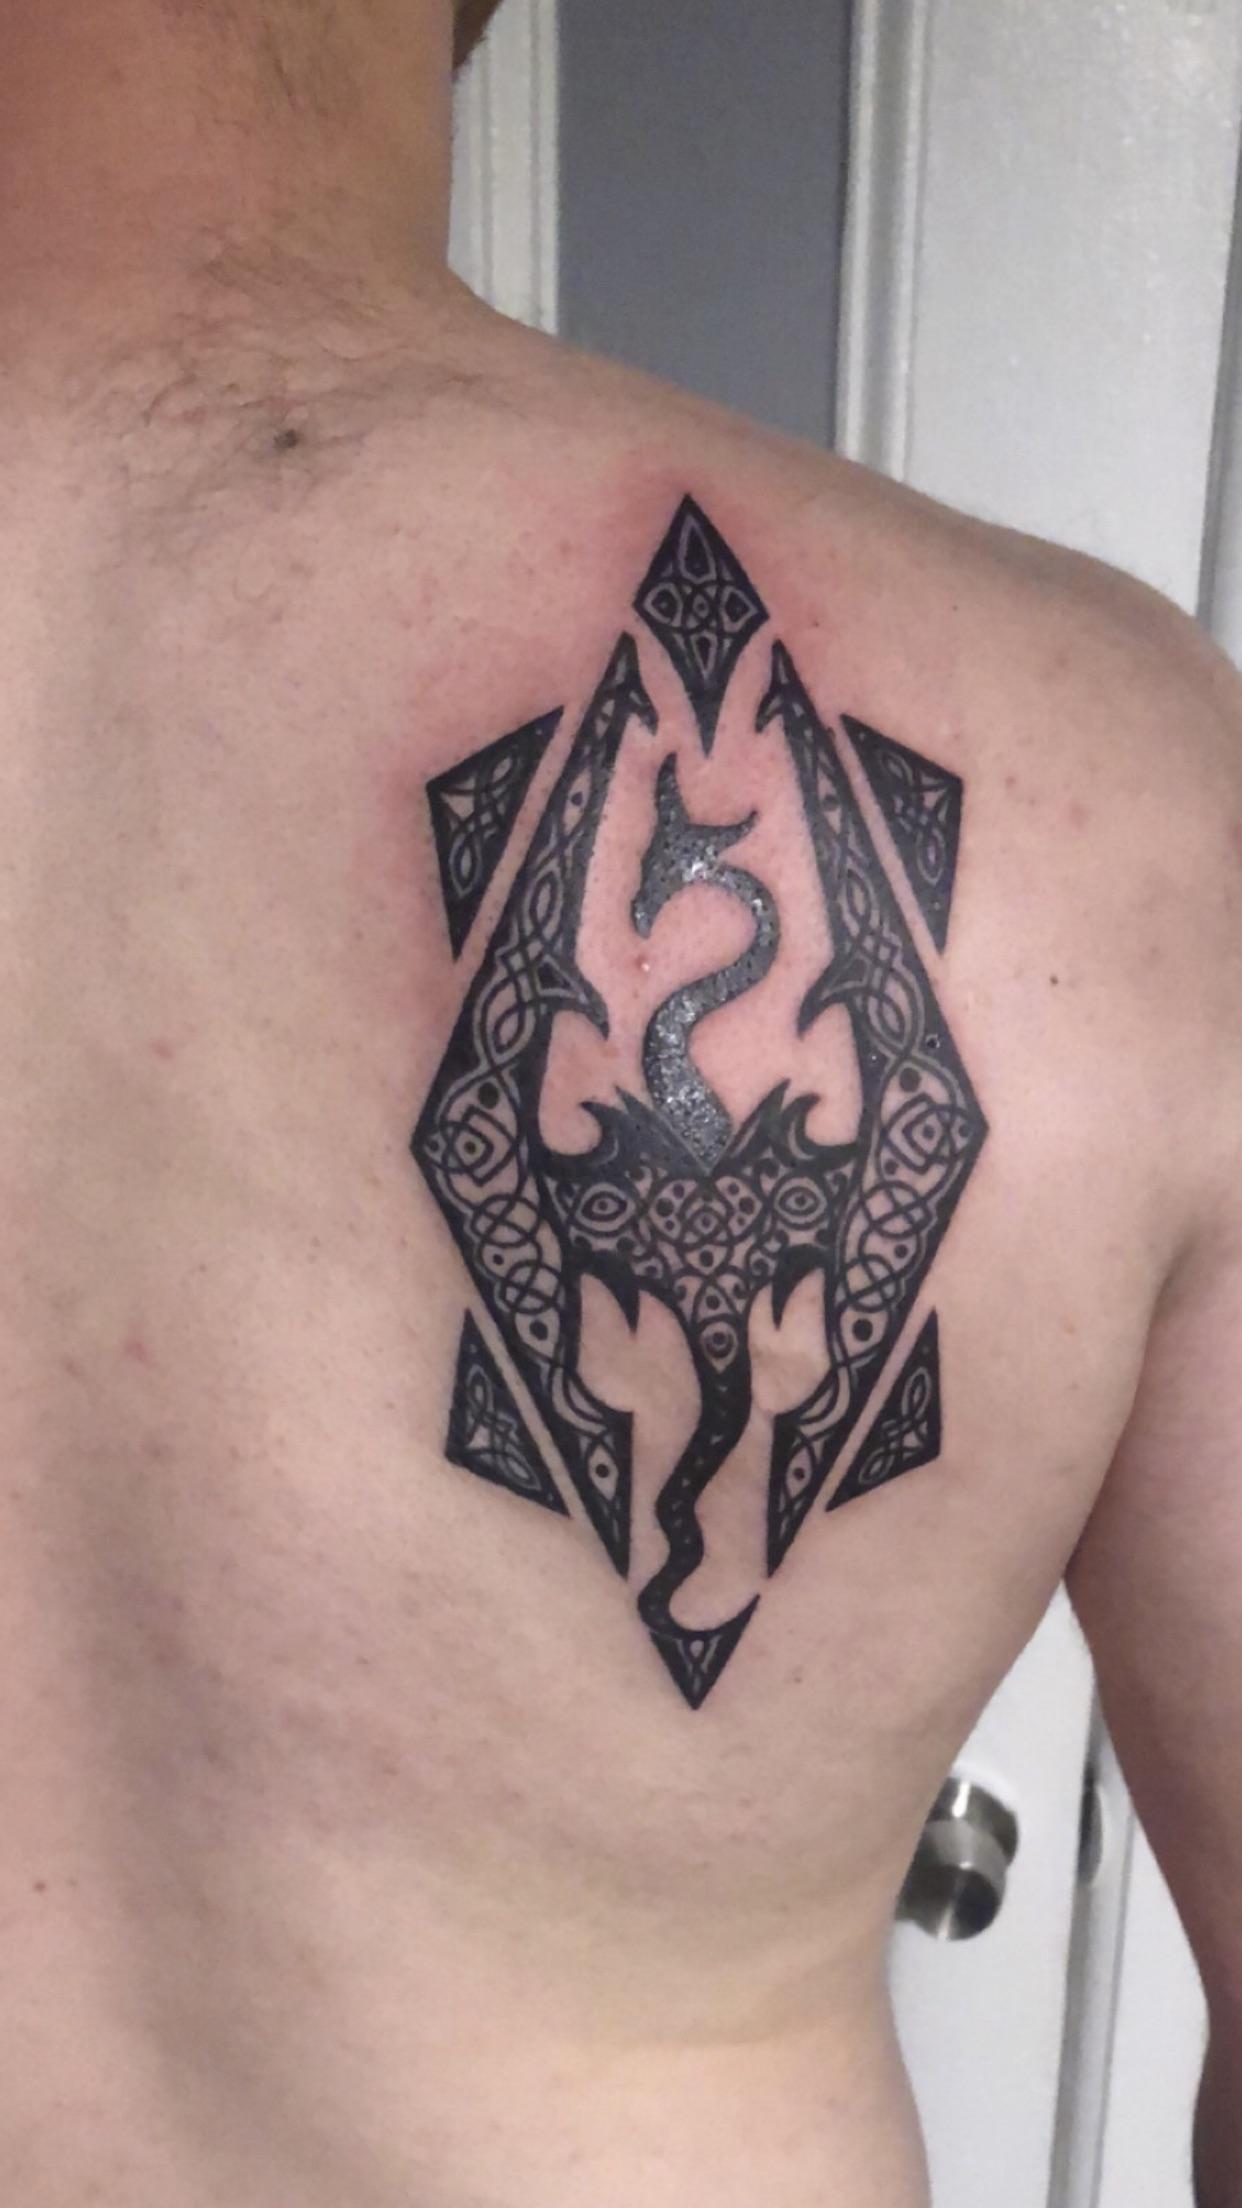 Skyrim Logo Tattoo : skyrim, tattoo, Skyrim, Tattoo, Recently